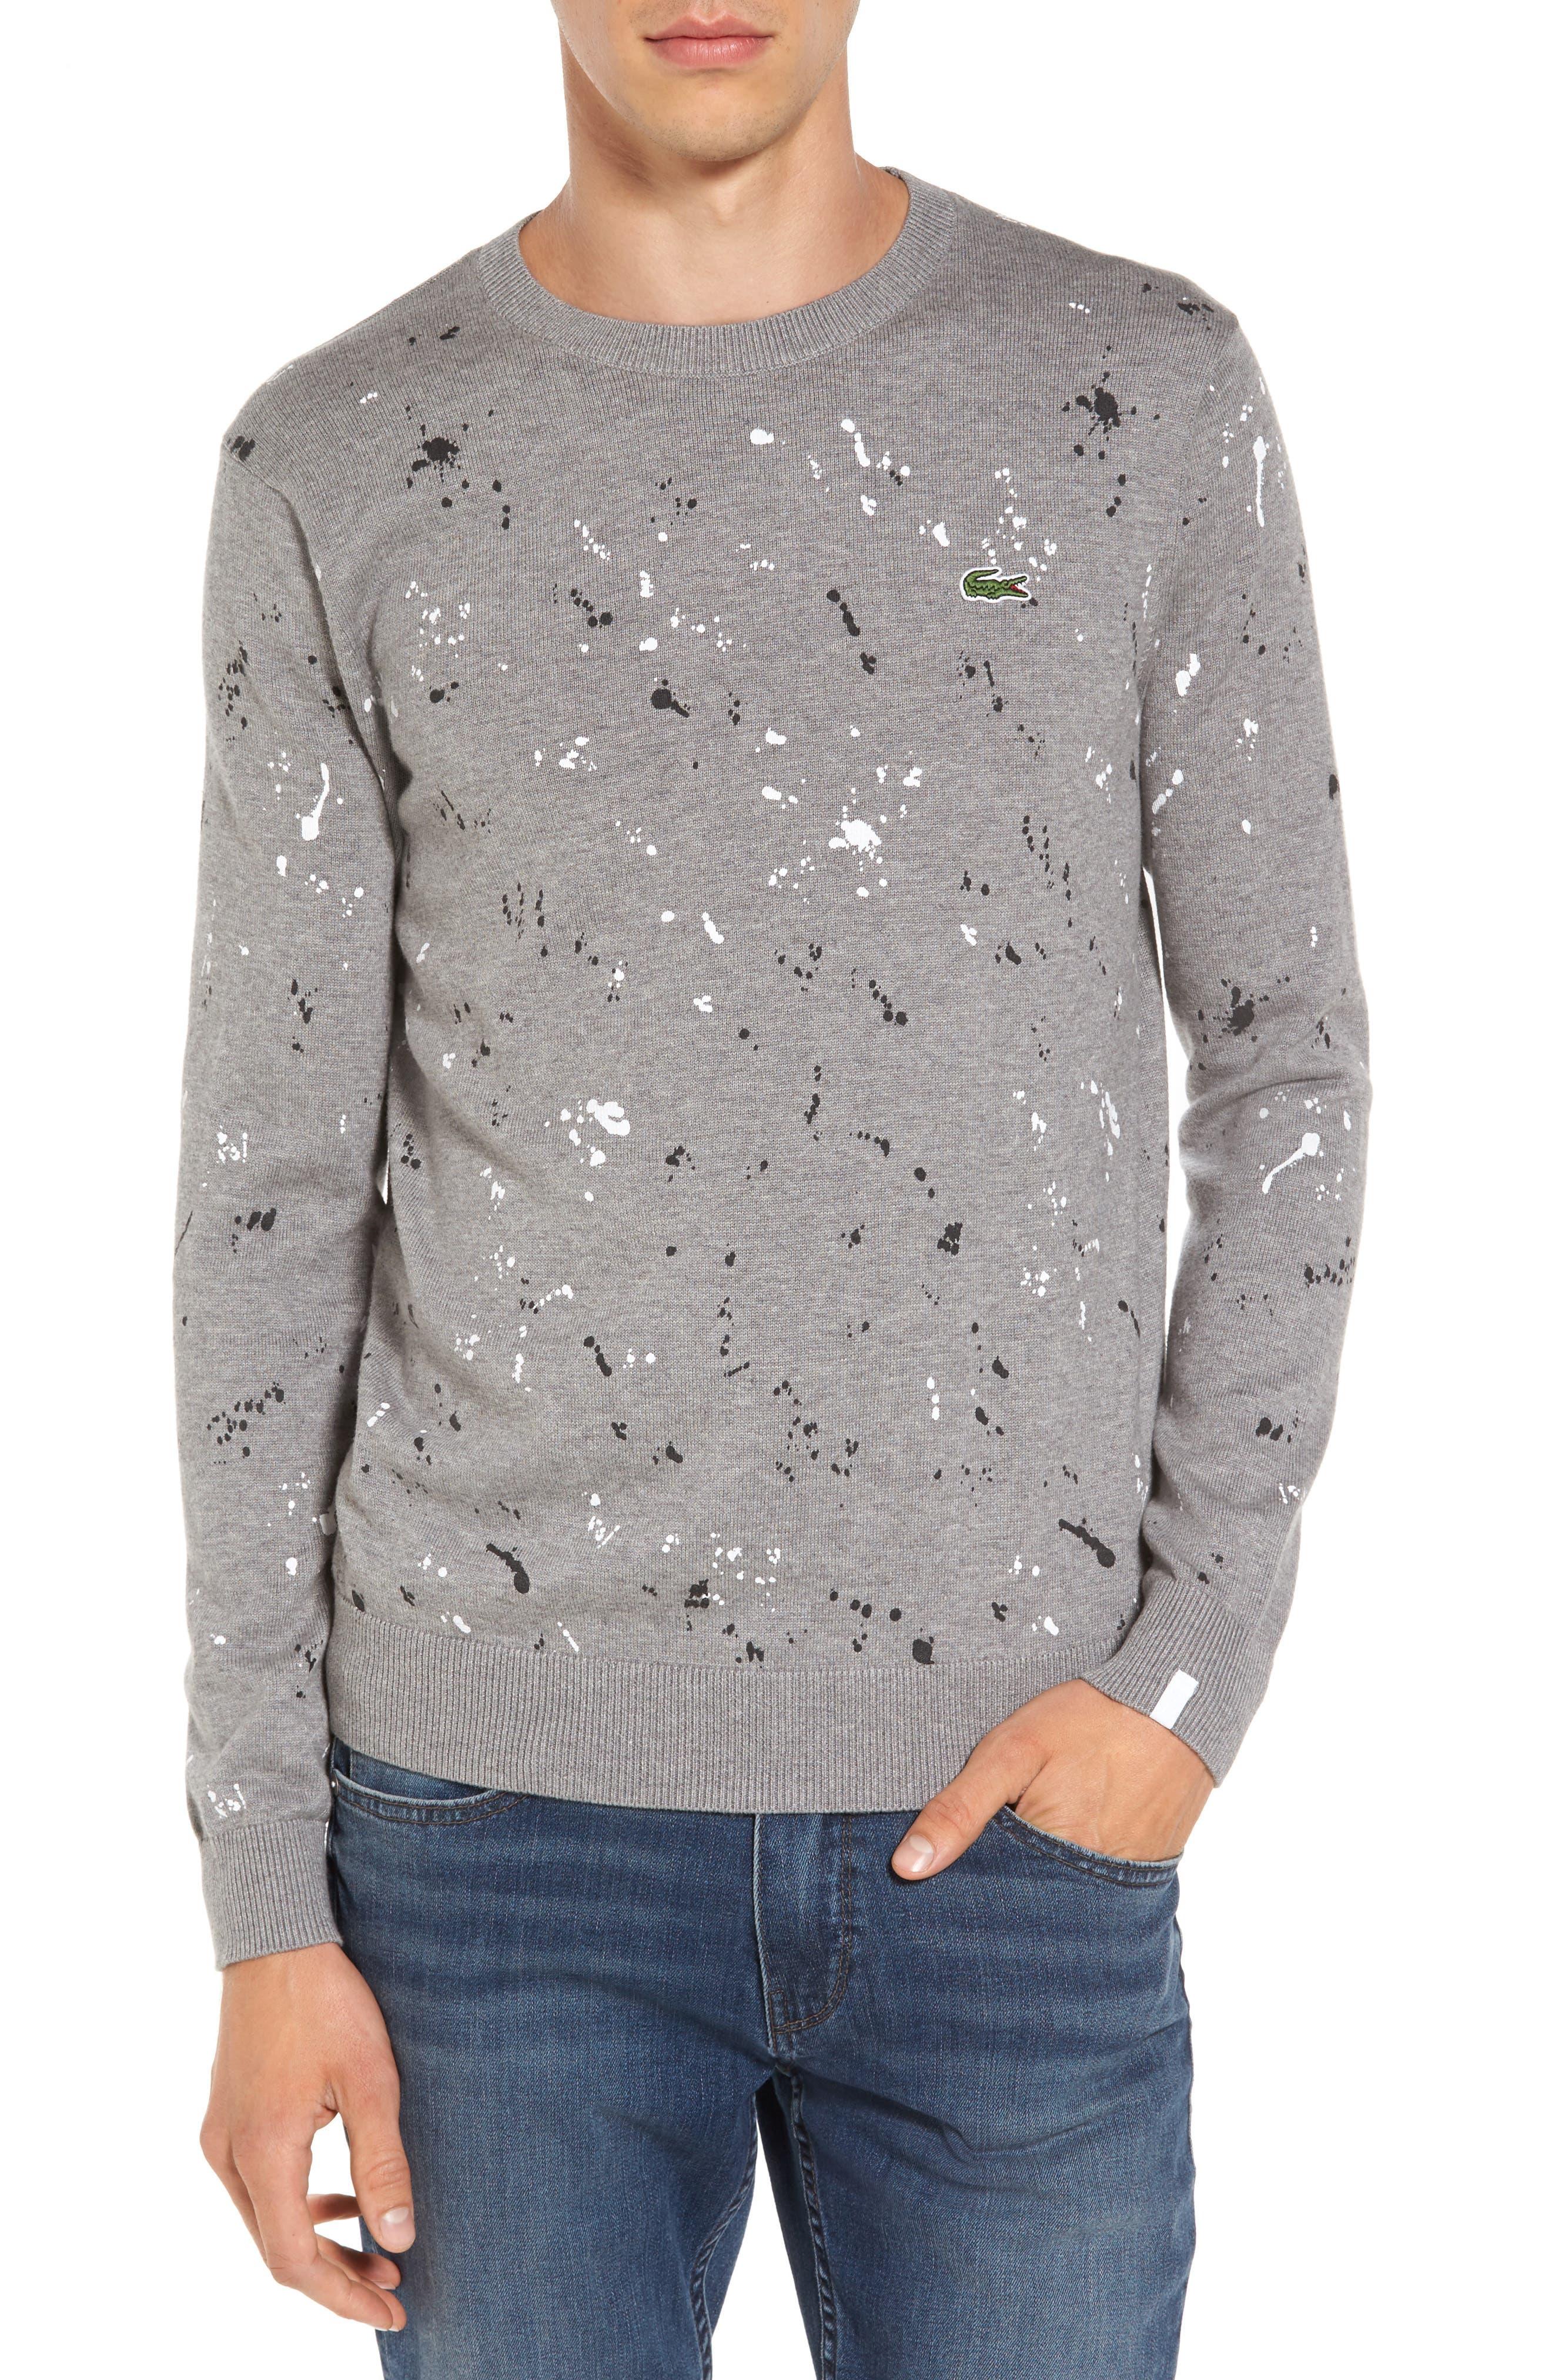 Main Image - Lacoste Splatter Sweater